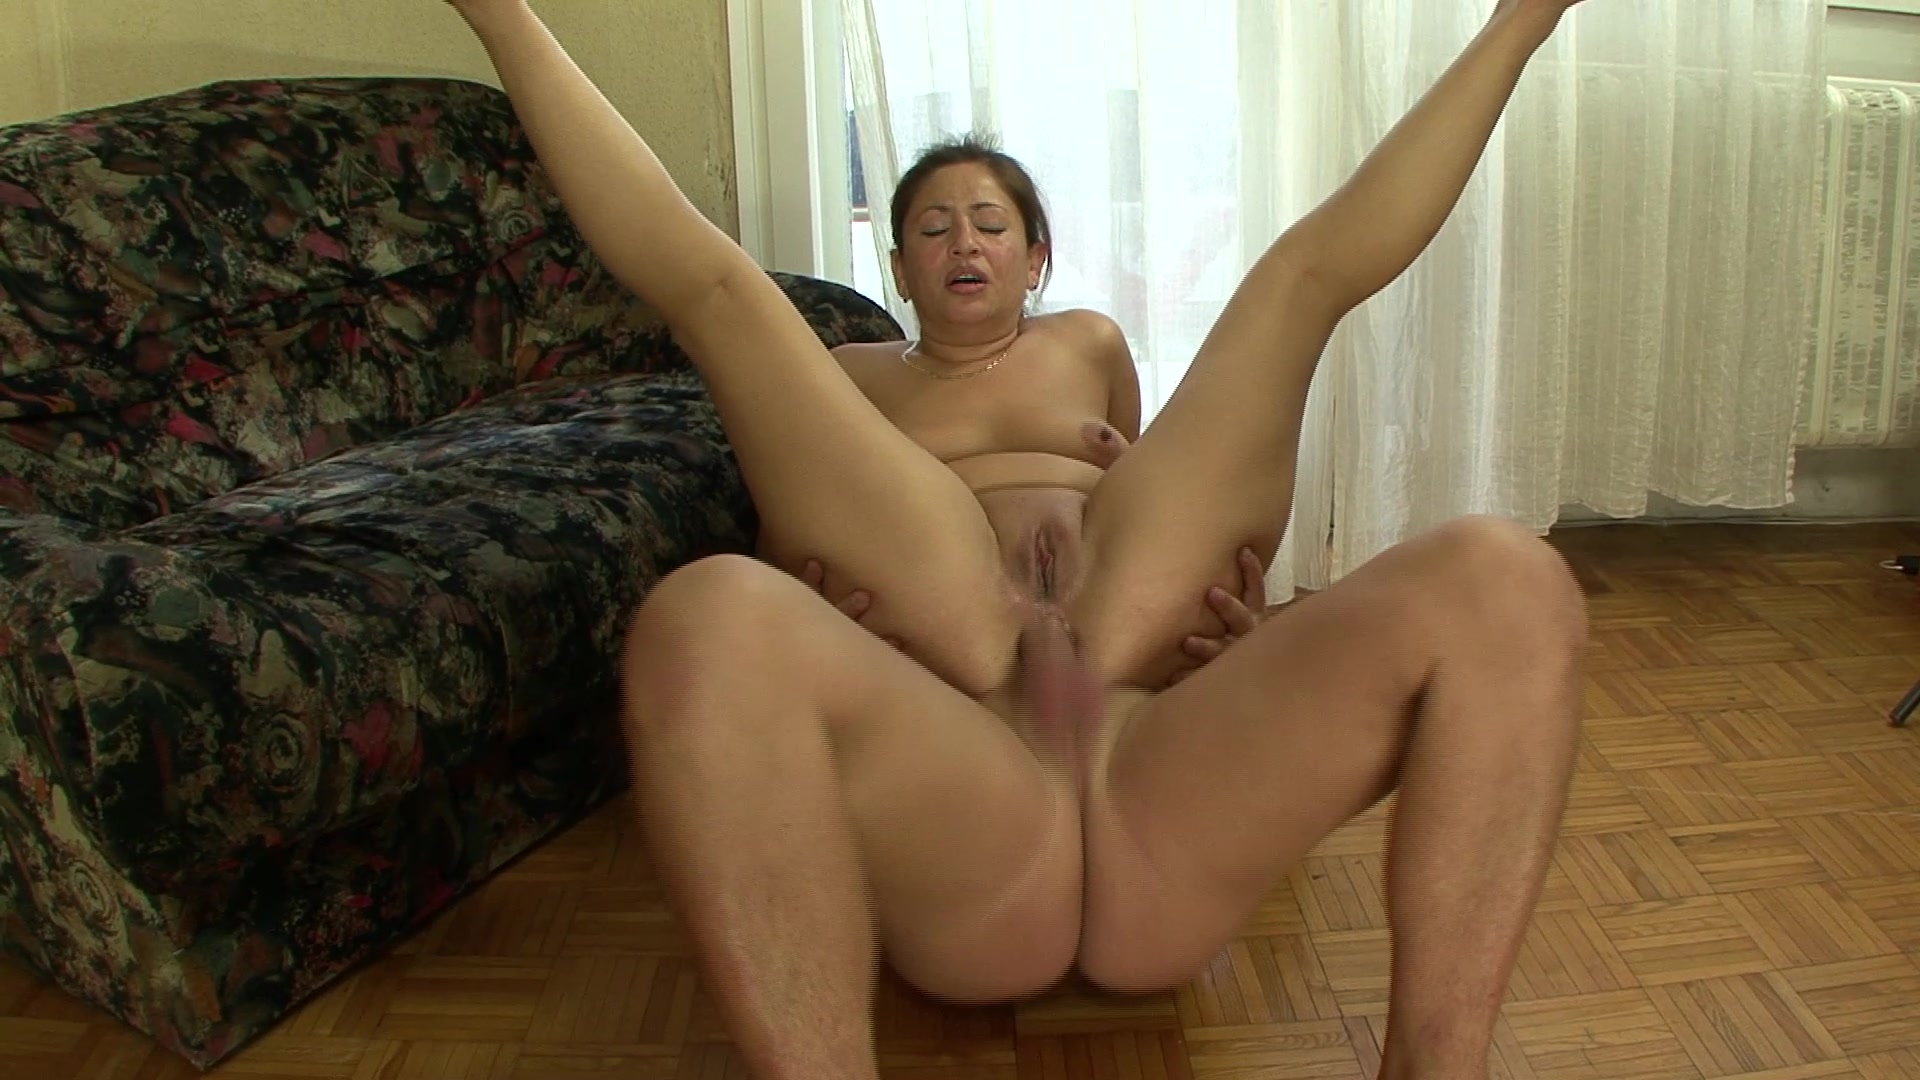 Hausfrauen 40